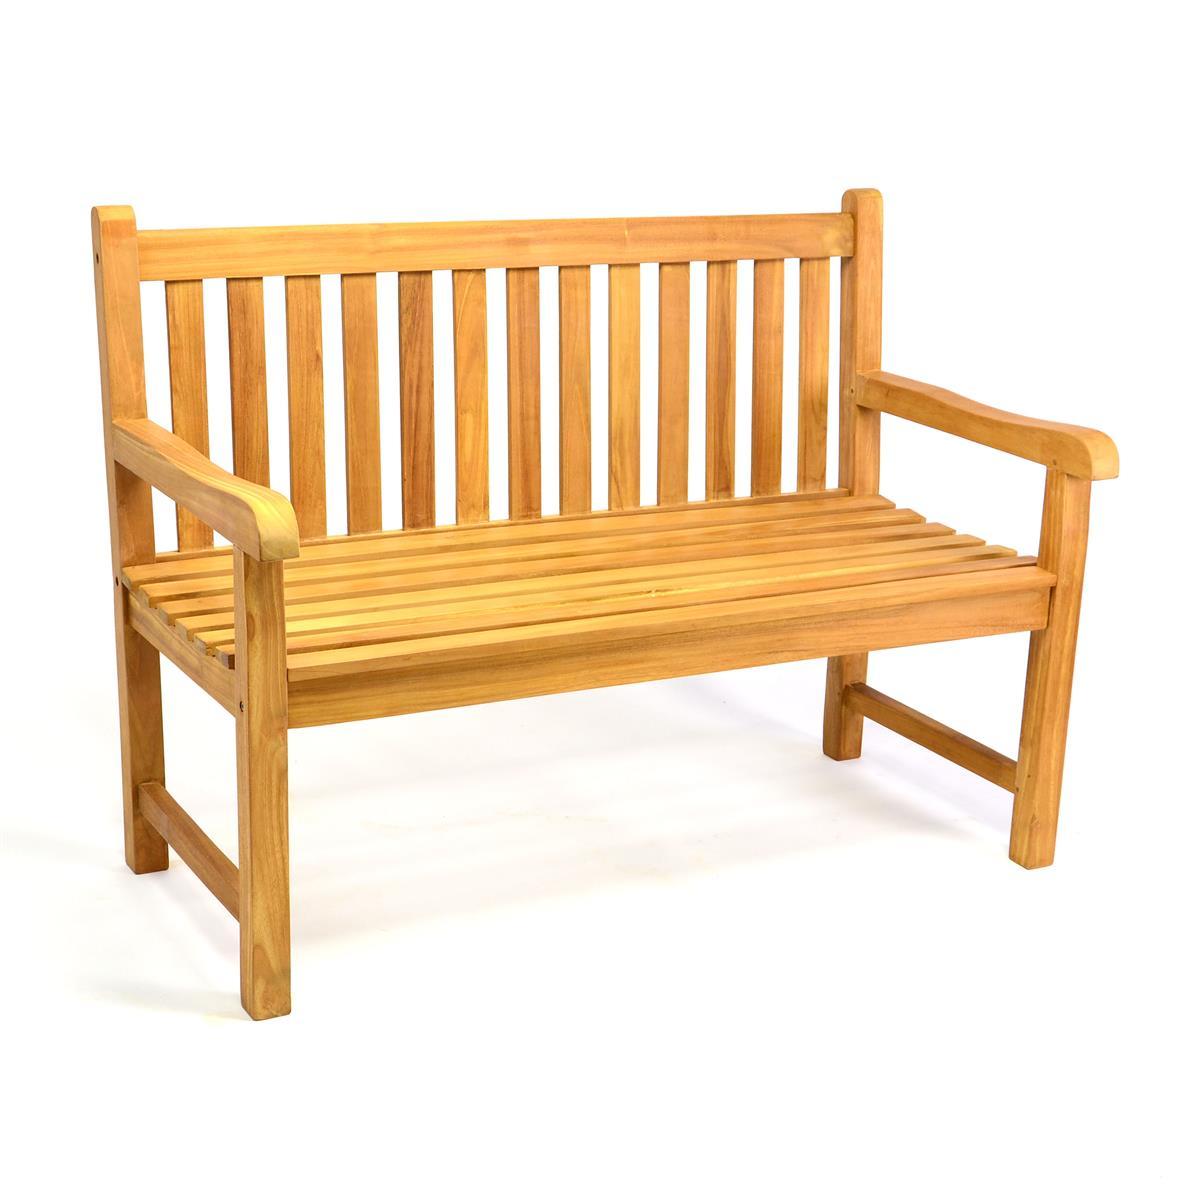 DIVERO 2-Sitzer Gartenbank Parkbank hochwertig Teak Holz behandelt 120cm